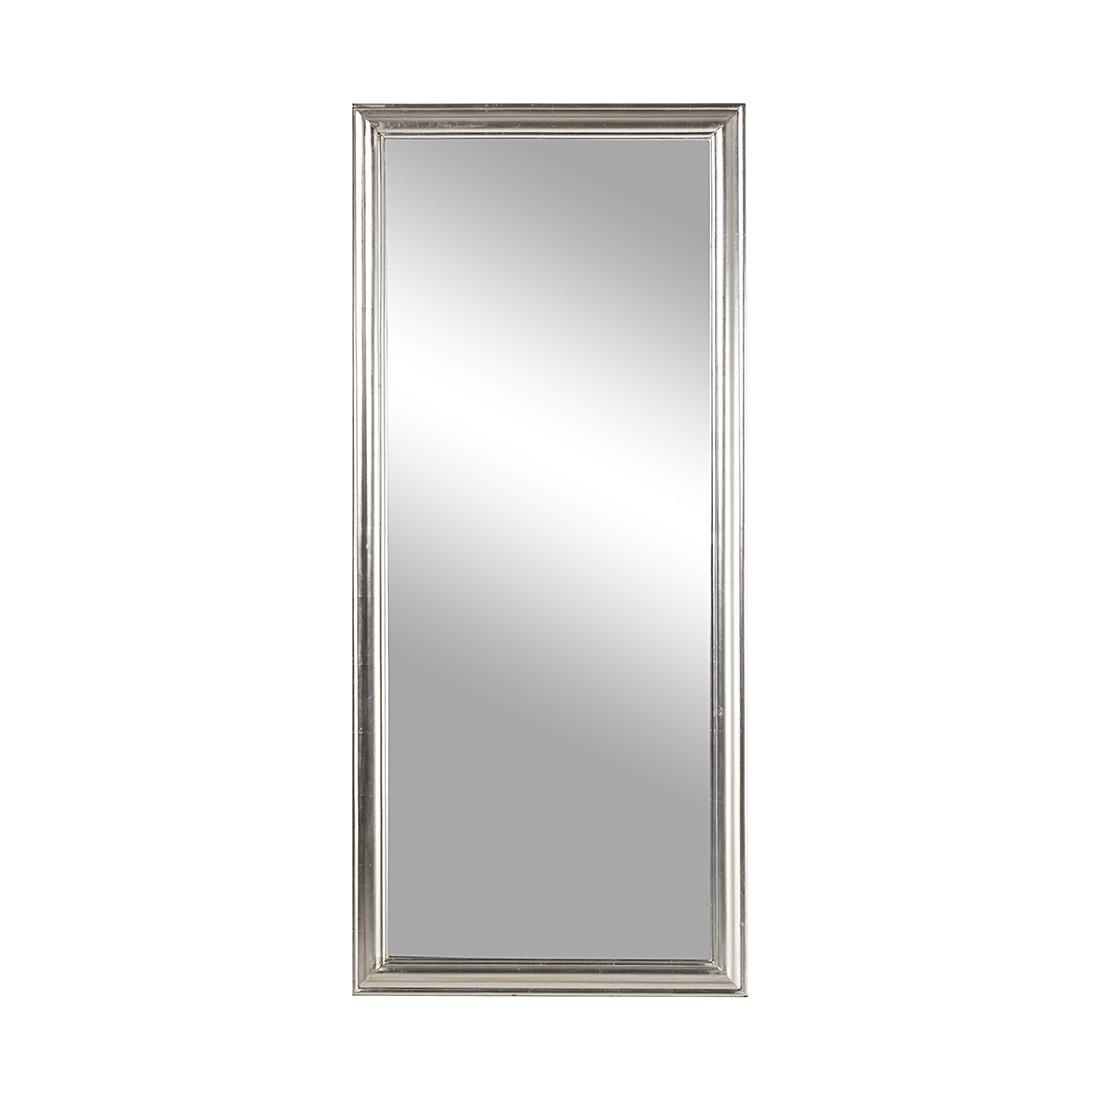 Spiegel Belleville - wandspiegel - zilver - 62x187x7cm